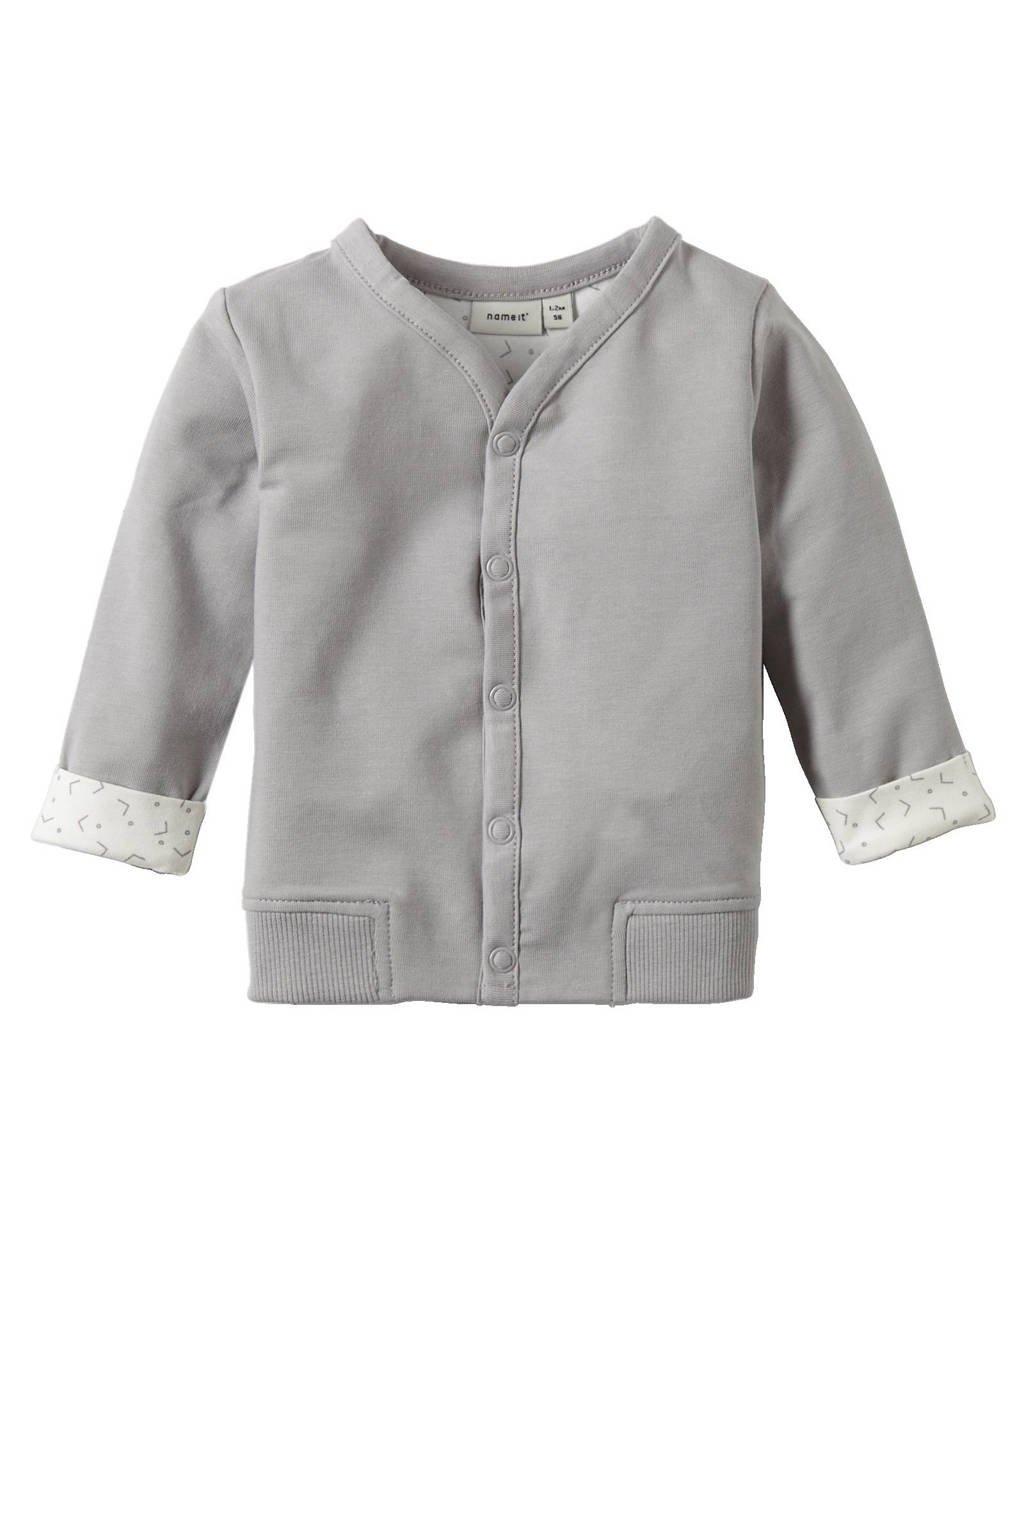 name it BABY newborn baby vest Delimo, Greige